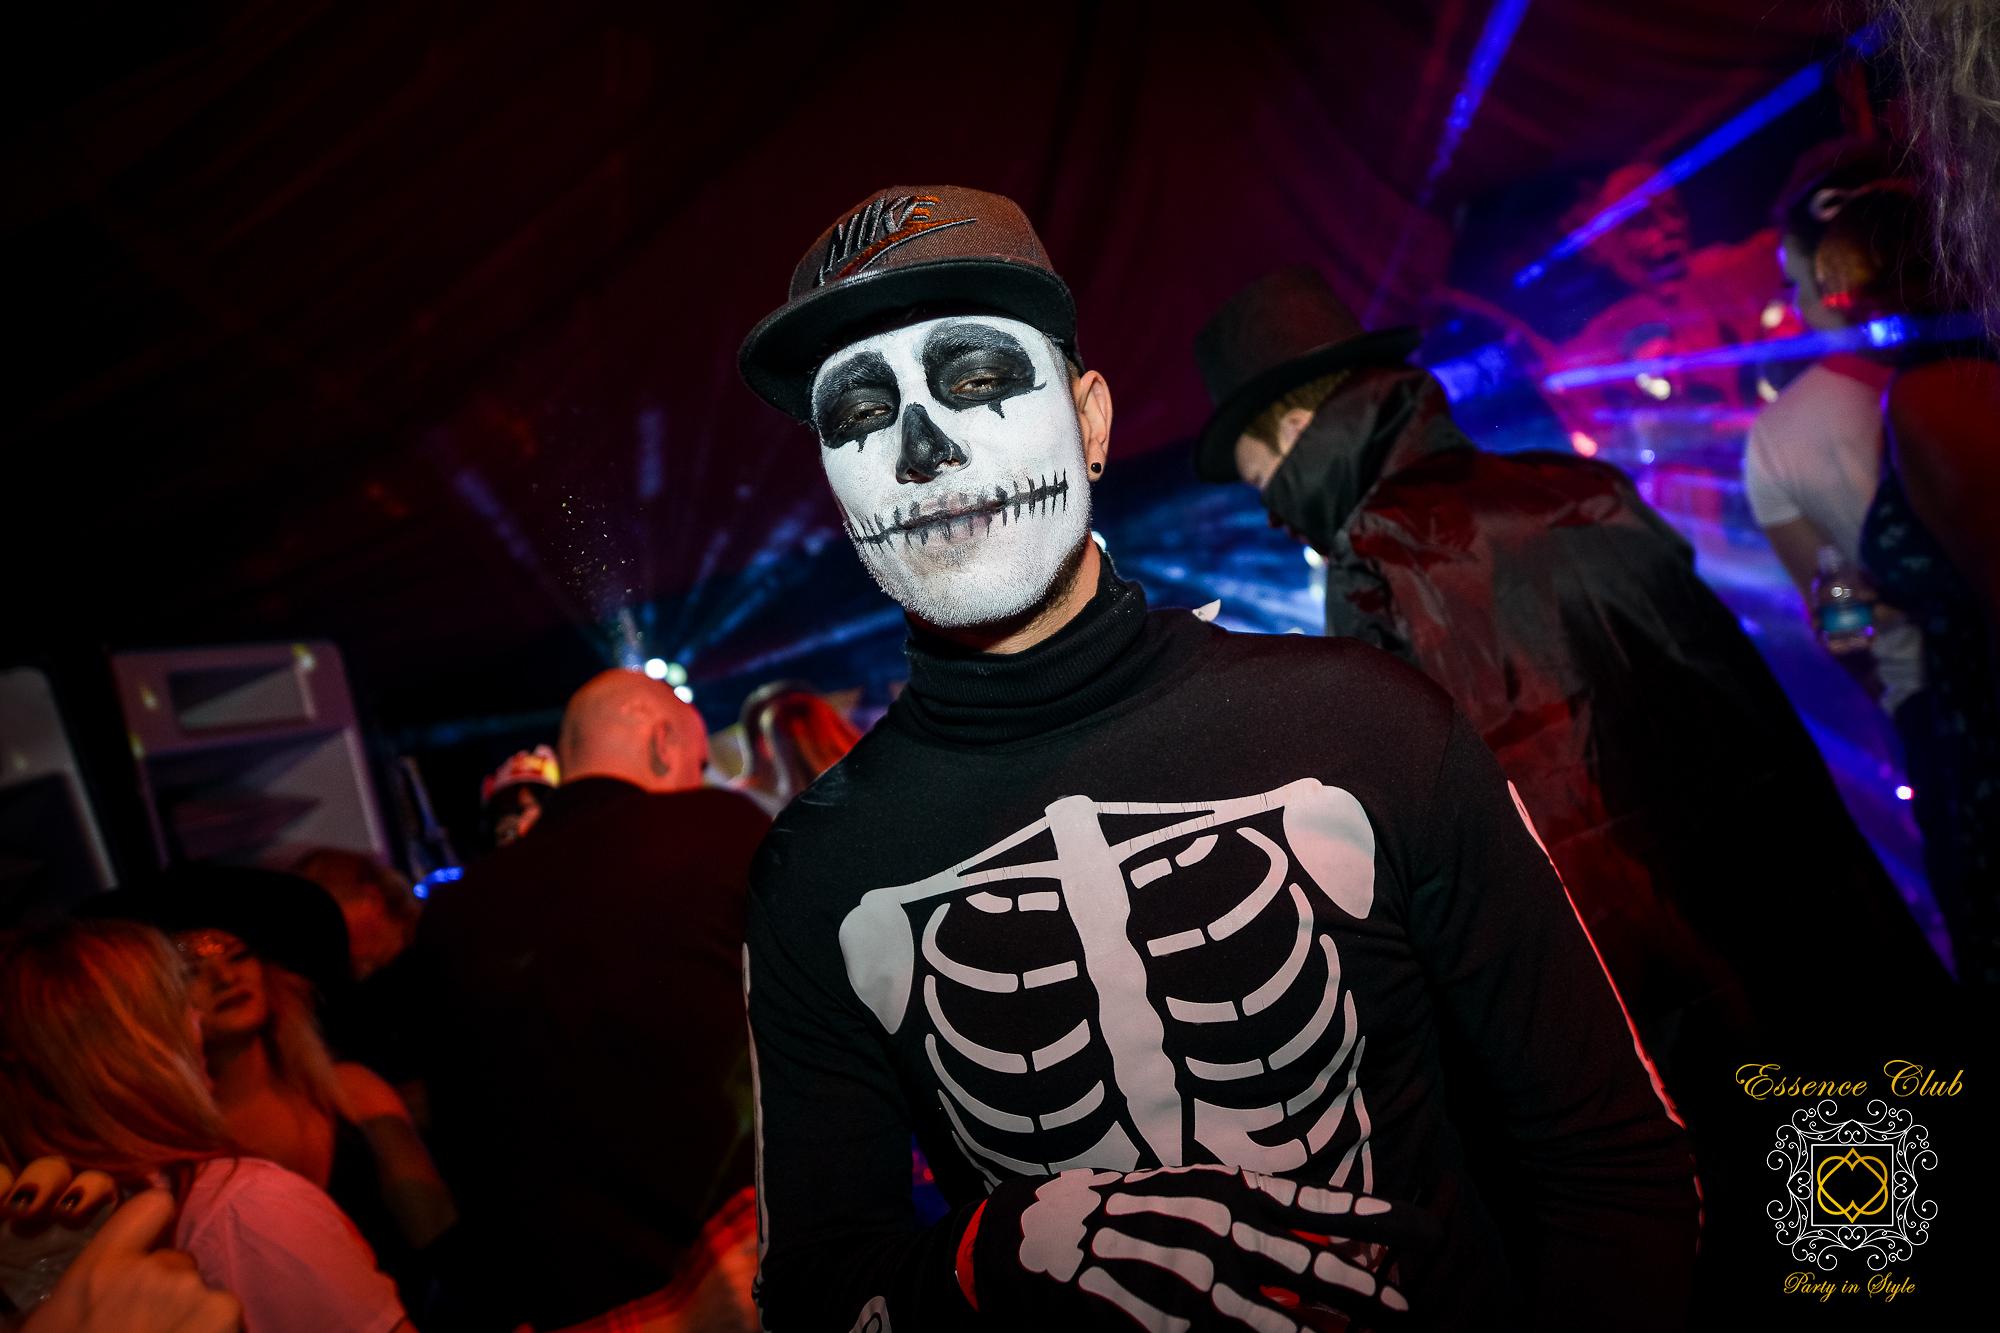 Halloween essence club event